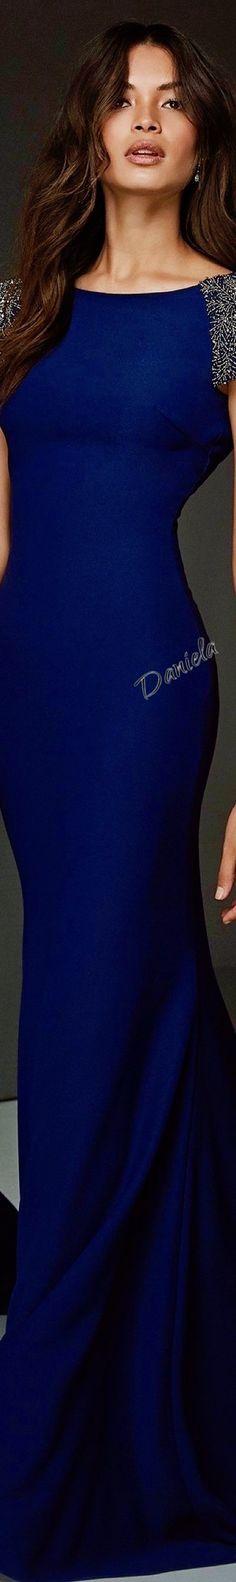 Unique Dresses, Formal Dresses, Pretty Dresses, Pronovias Wedding Dress, Wedding Dresses, Feel Unique, Cocktail Gowns, Shades Of Blue, Dress Collection